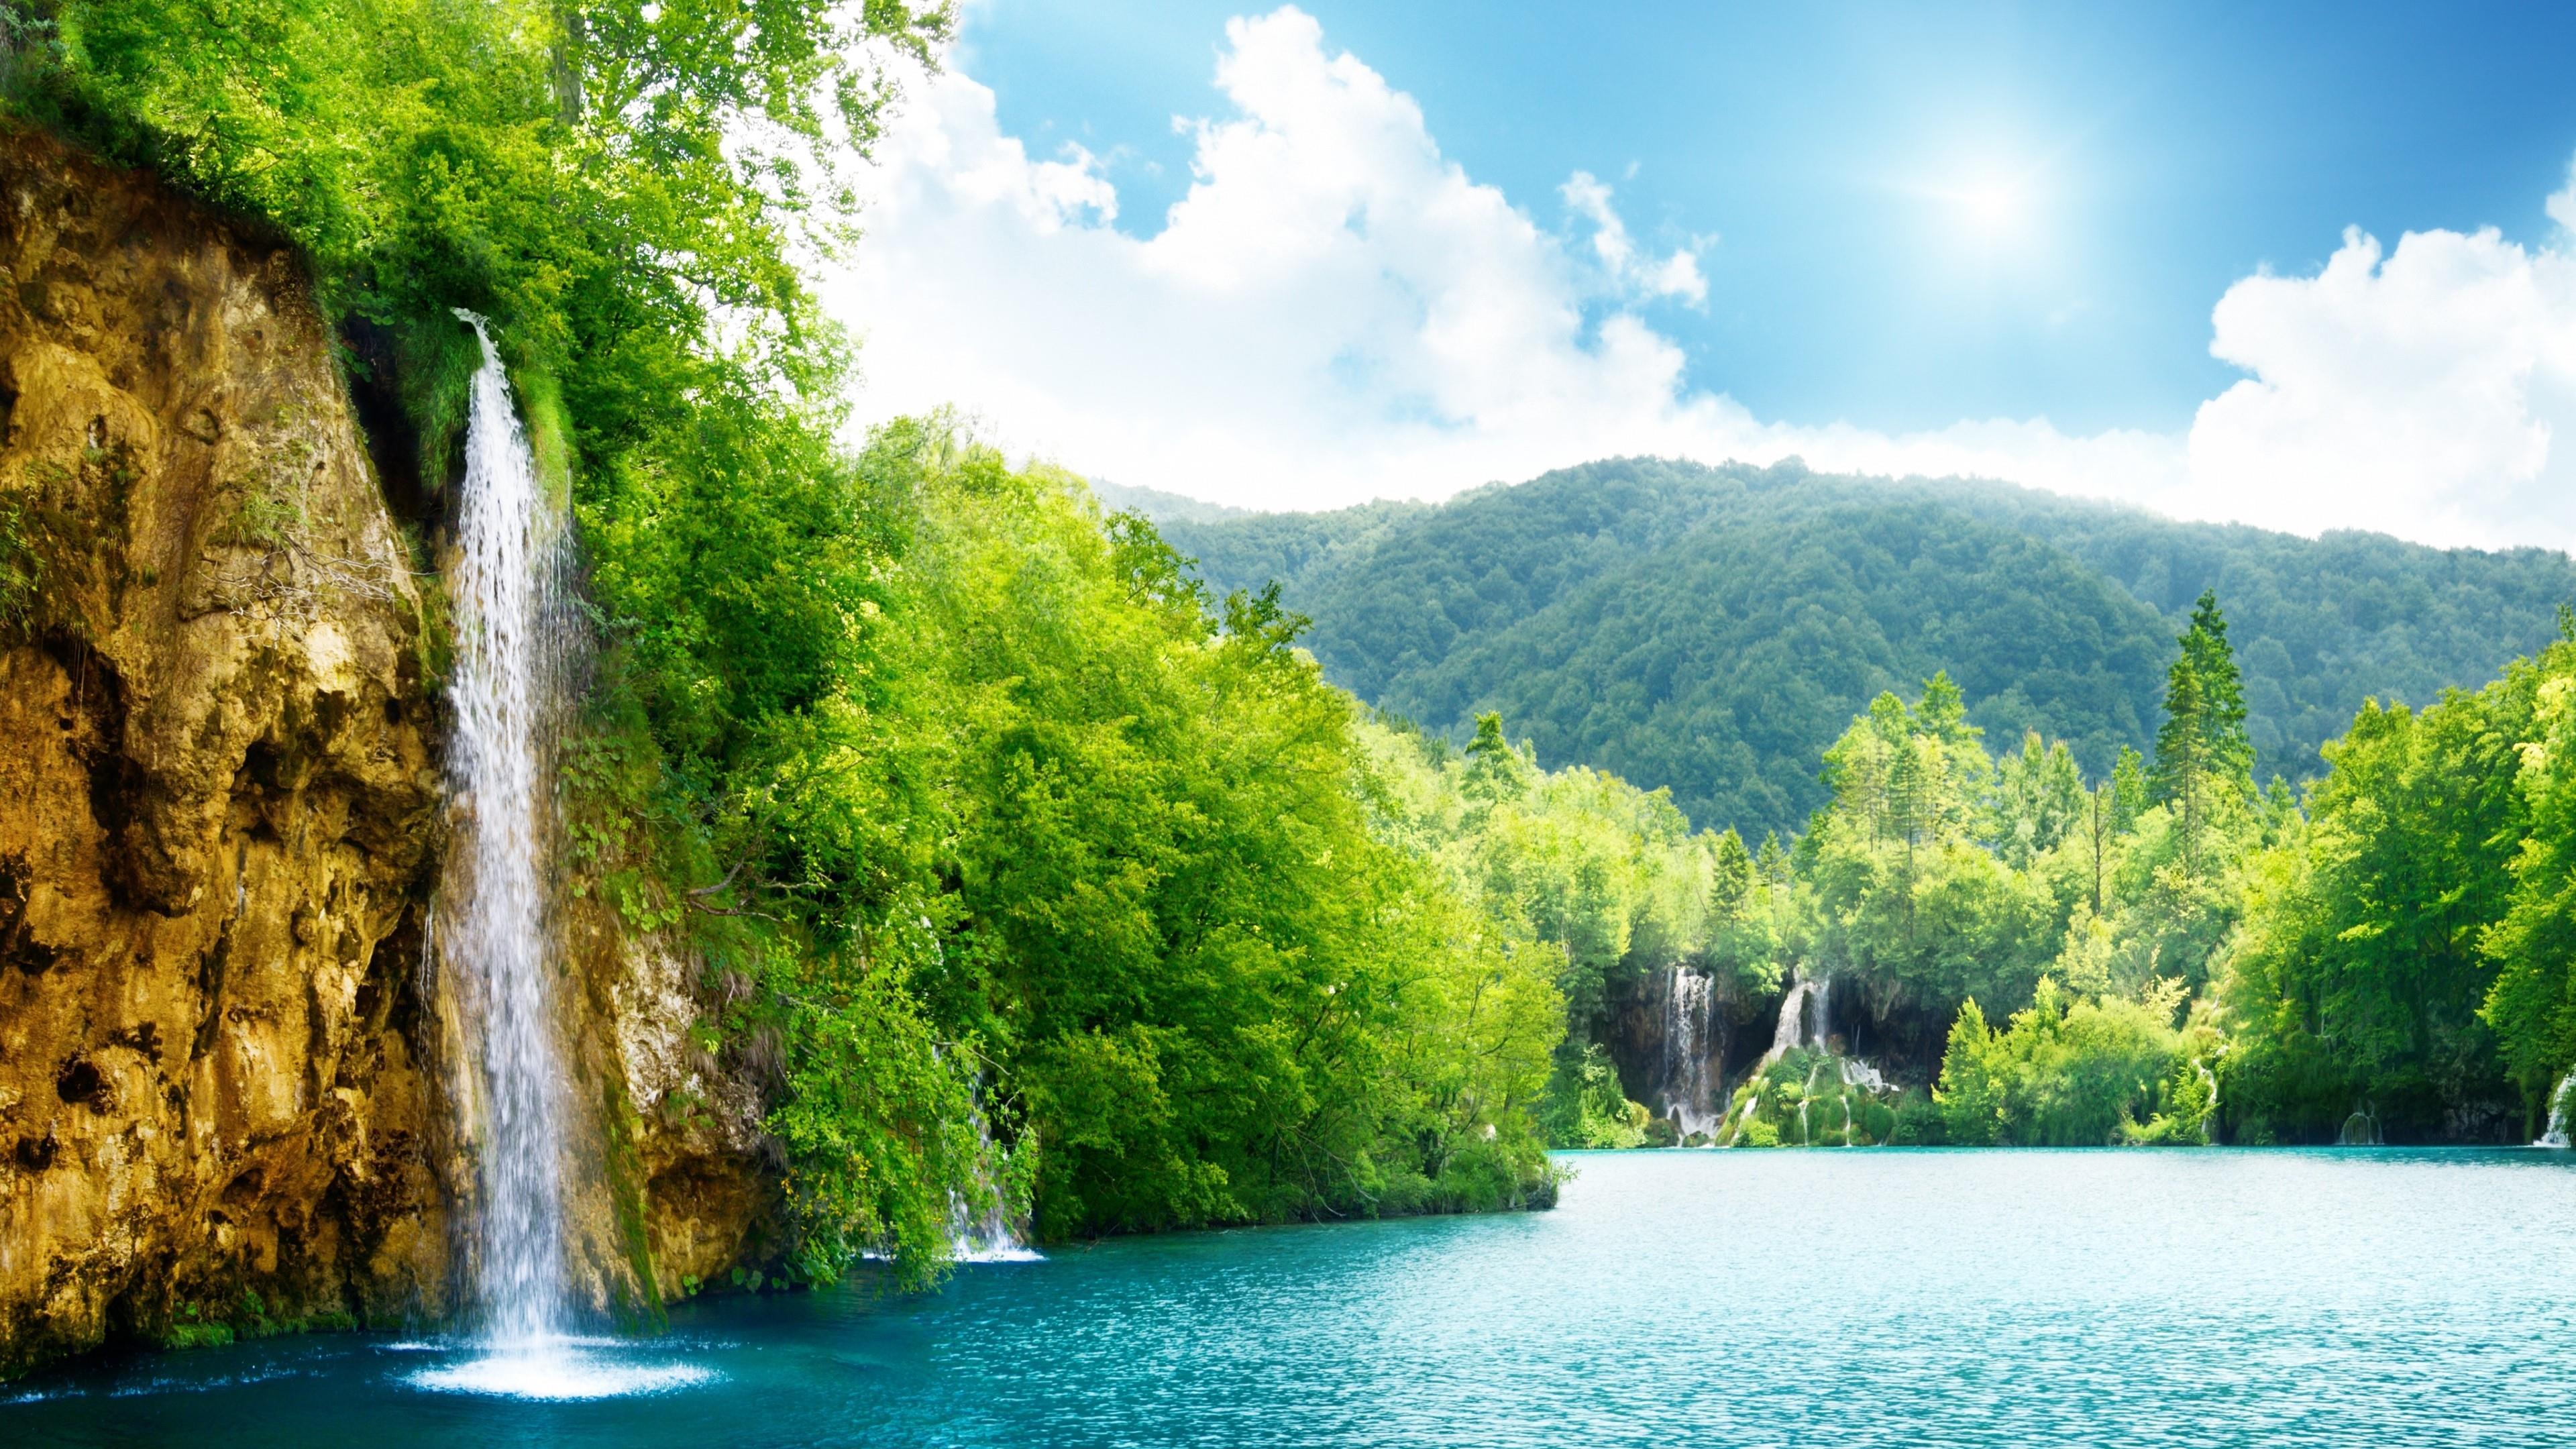 Waterfalls at Plitvice Lakes National Park wallpaper